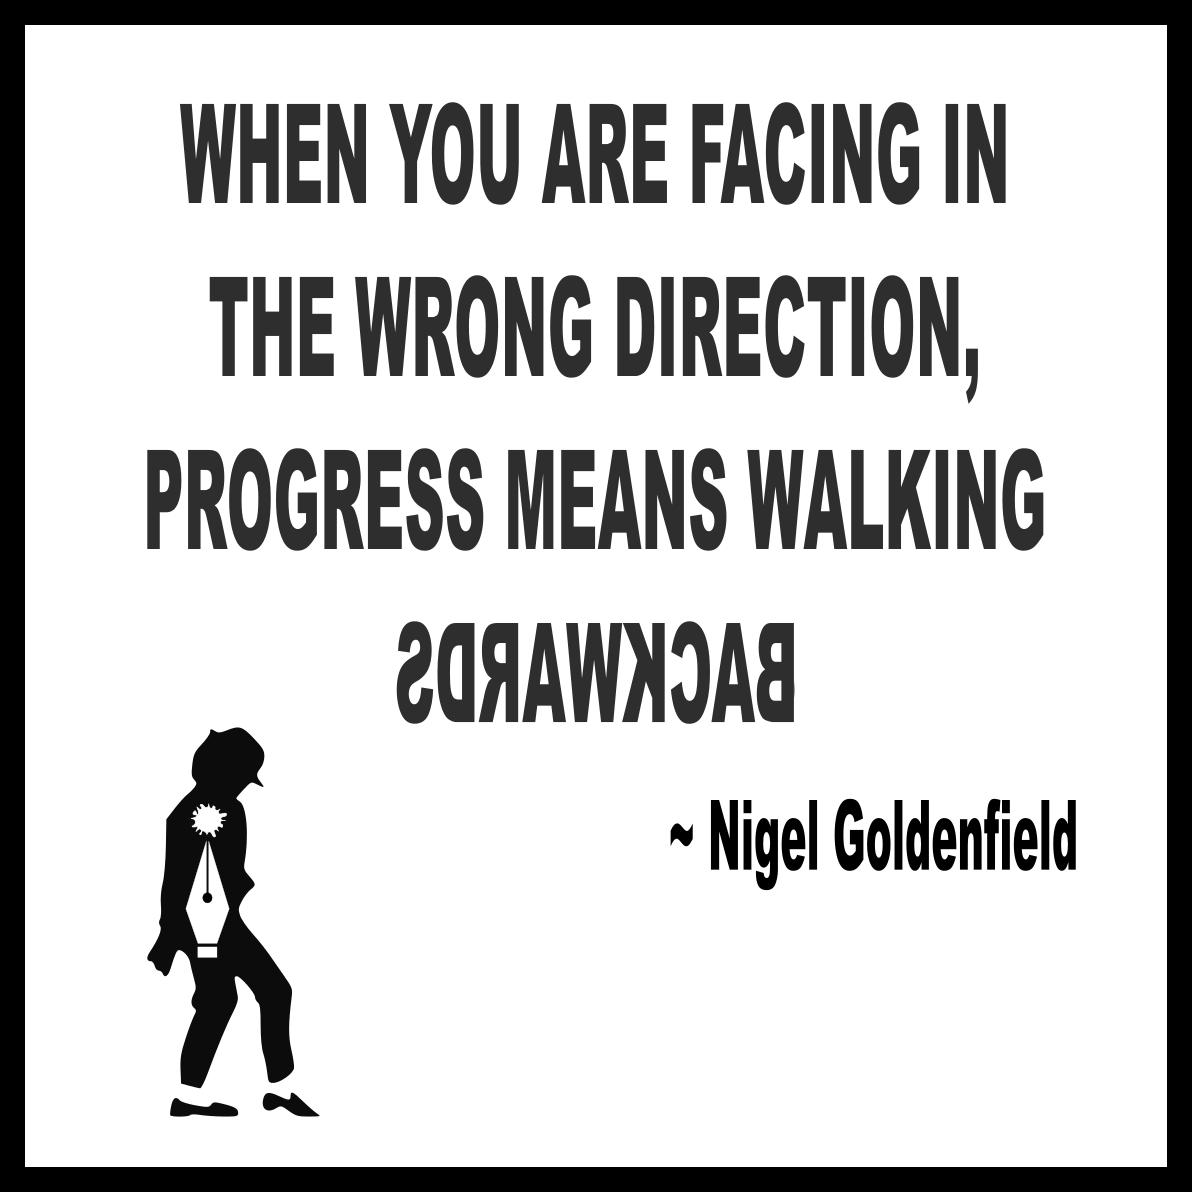 Nigel Goldenfield quote